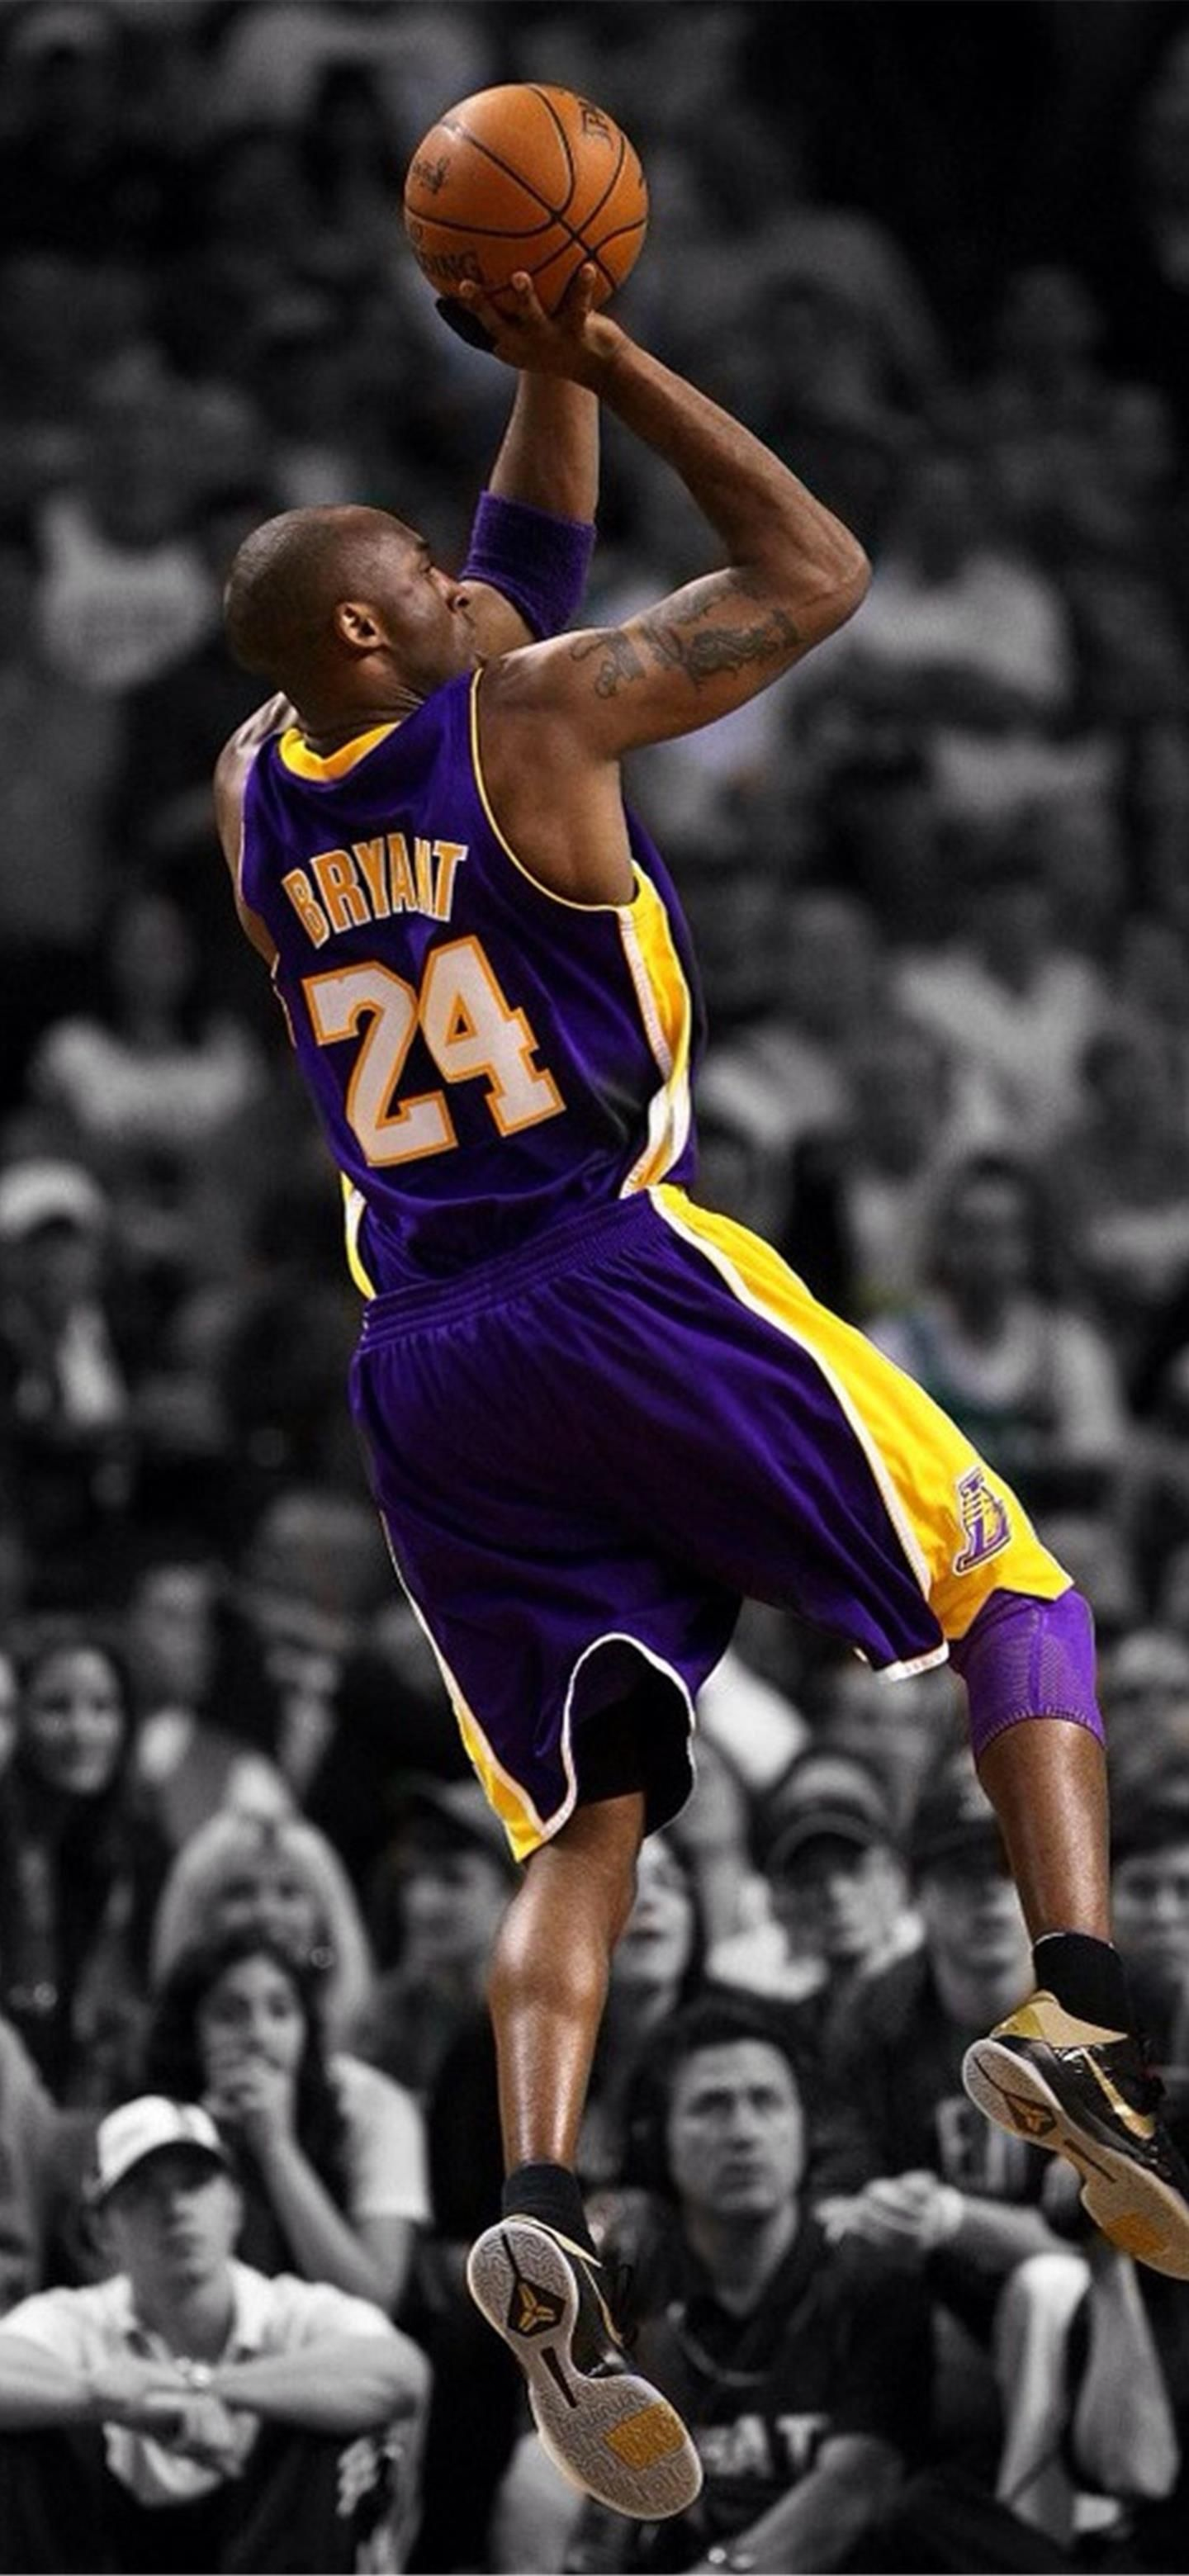 Free Download The Nba Super Star Brant Kobe Show Wallpaper Beaty Your Phone Celebrity Sport In 2020 Kobe Bryant Wallpaper Kobe Bryant Dunk Kobe Bryant Black Mamba